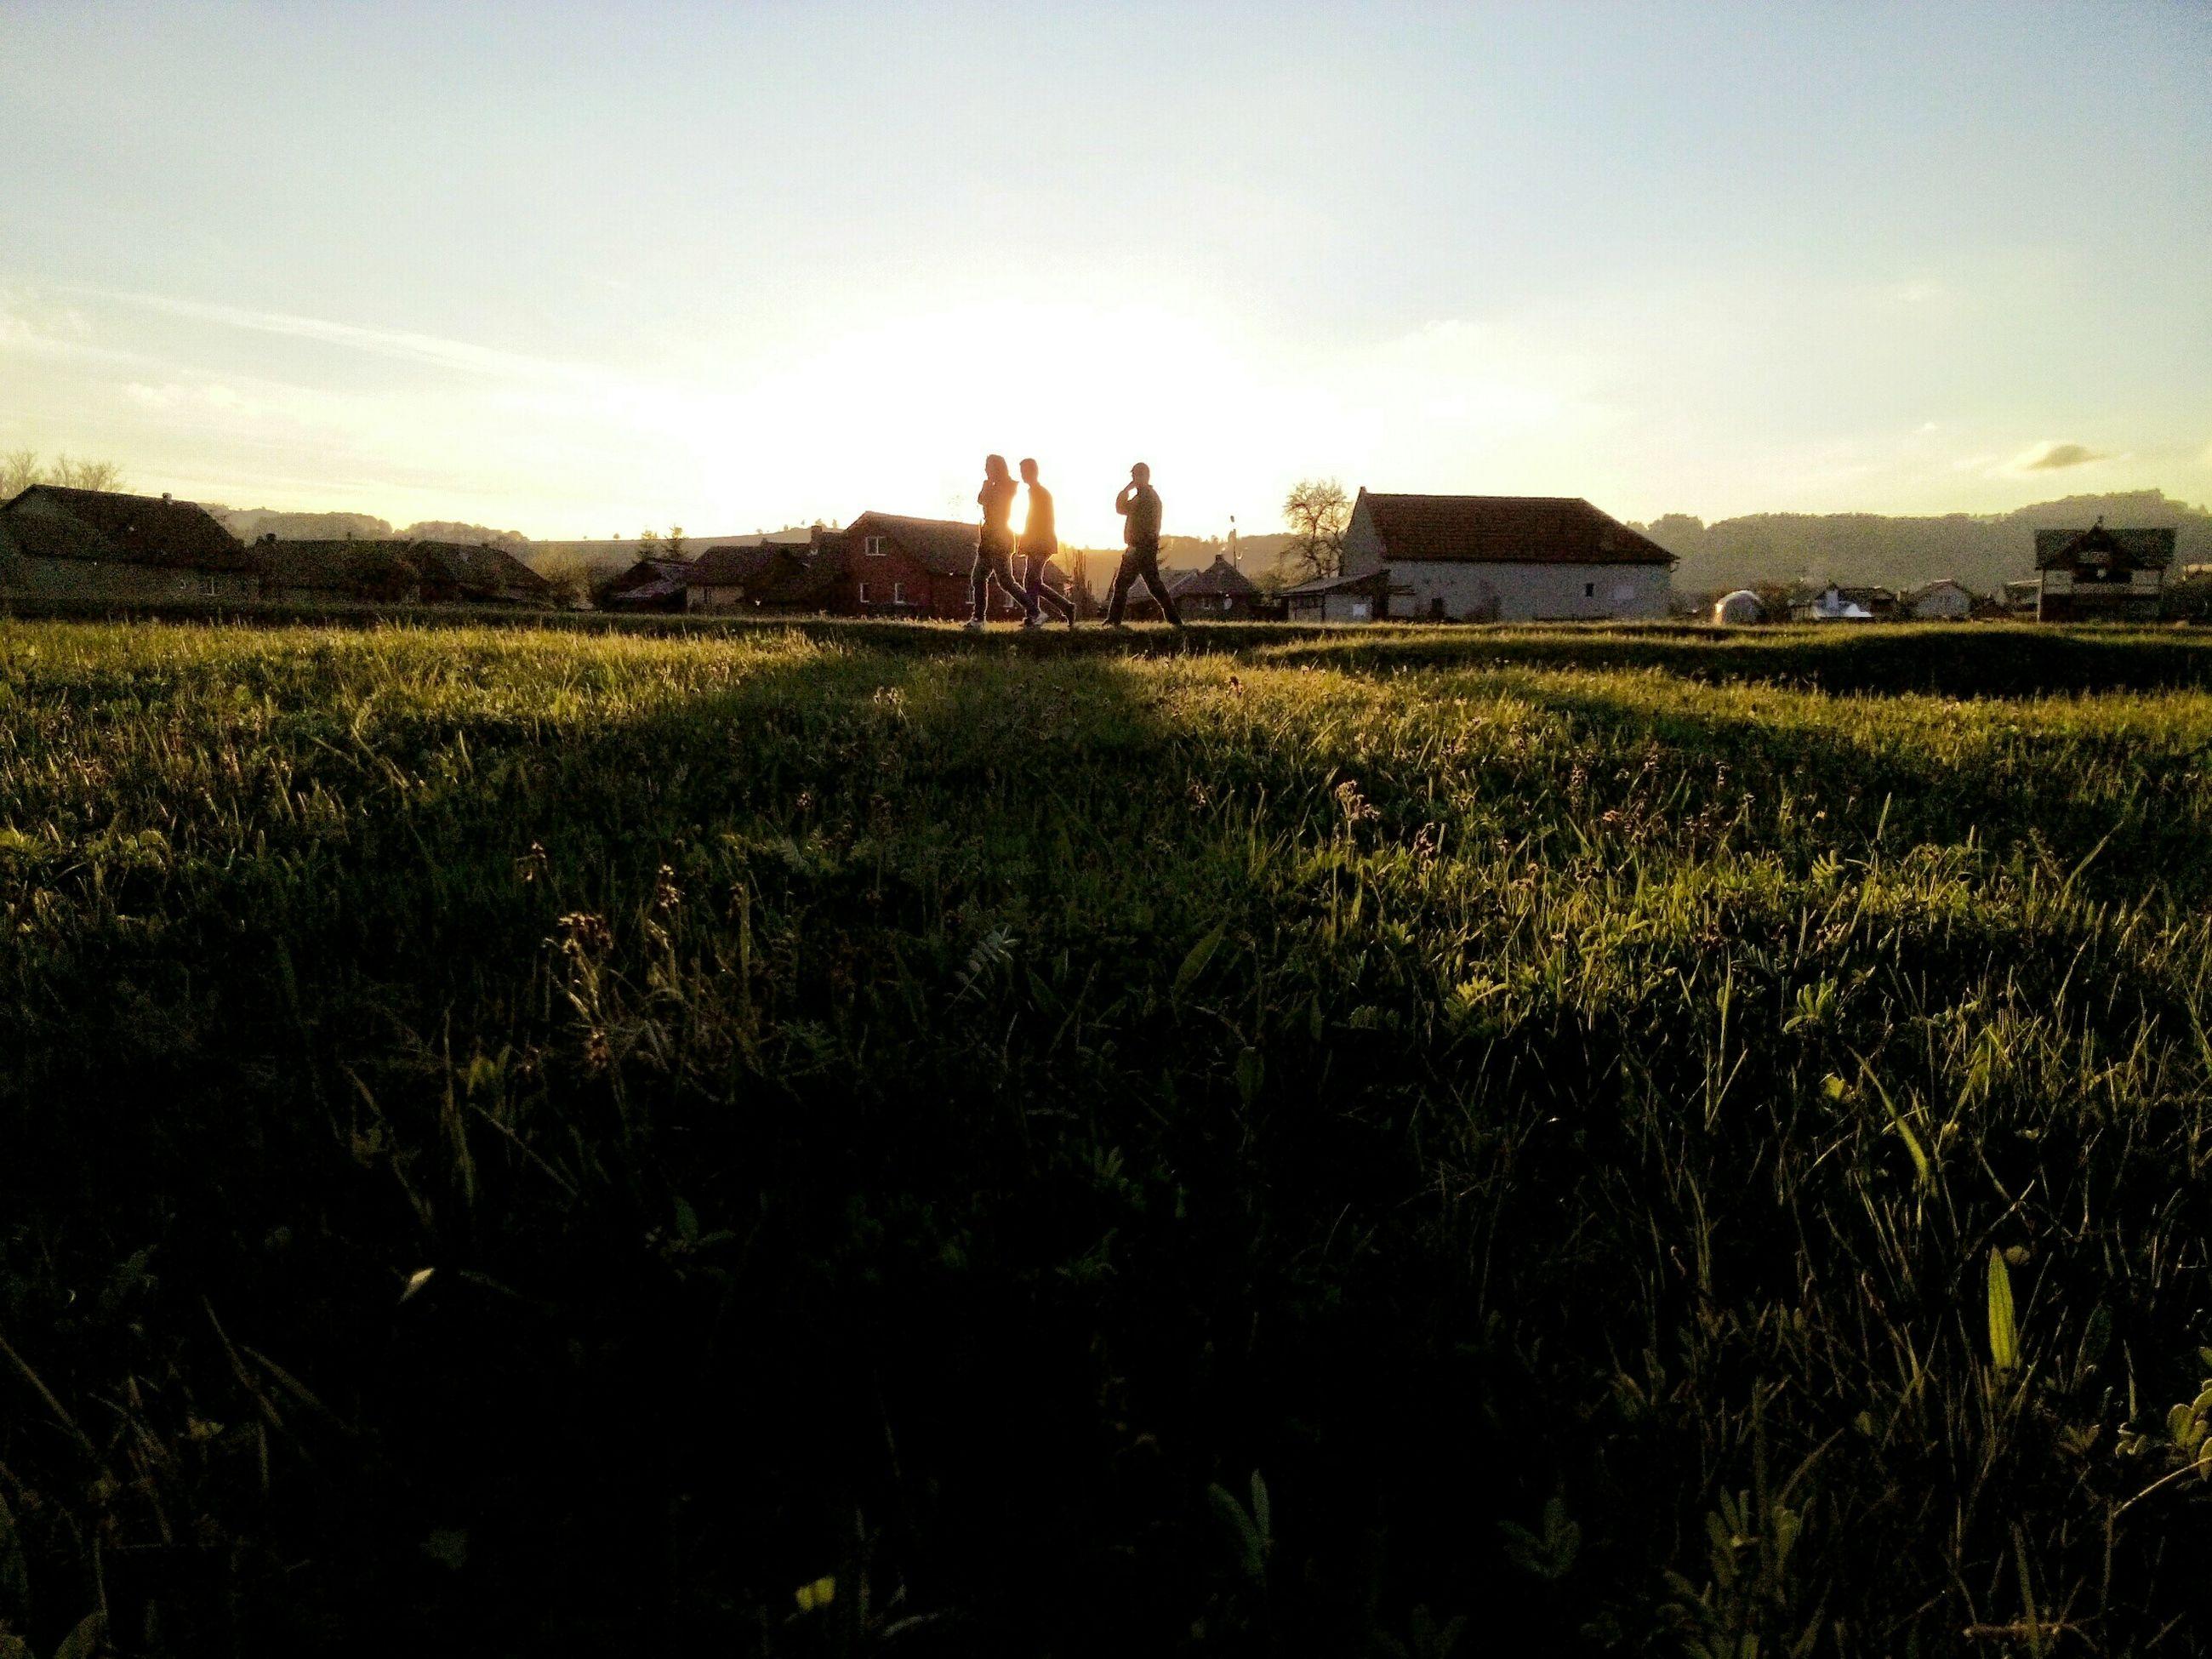 grass, field, sky, sunset, men, lifestyles, grassy, leisure activity, landscape, building exterior, nature, growth, built structure, plant, architecture, rural scene, sunlight, person